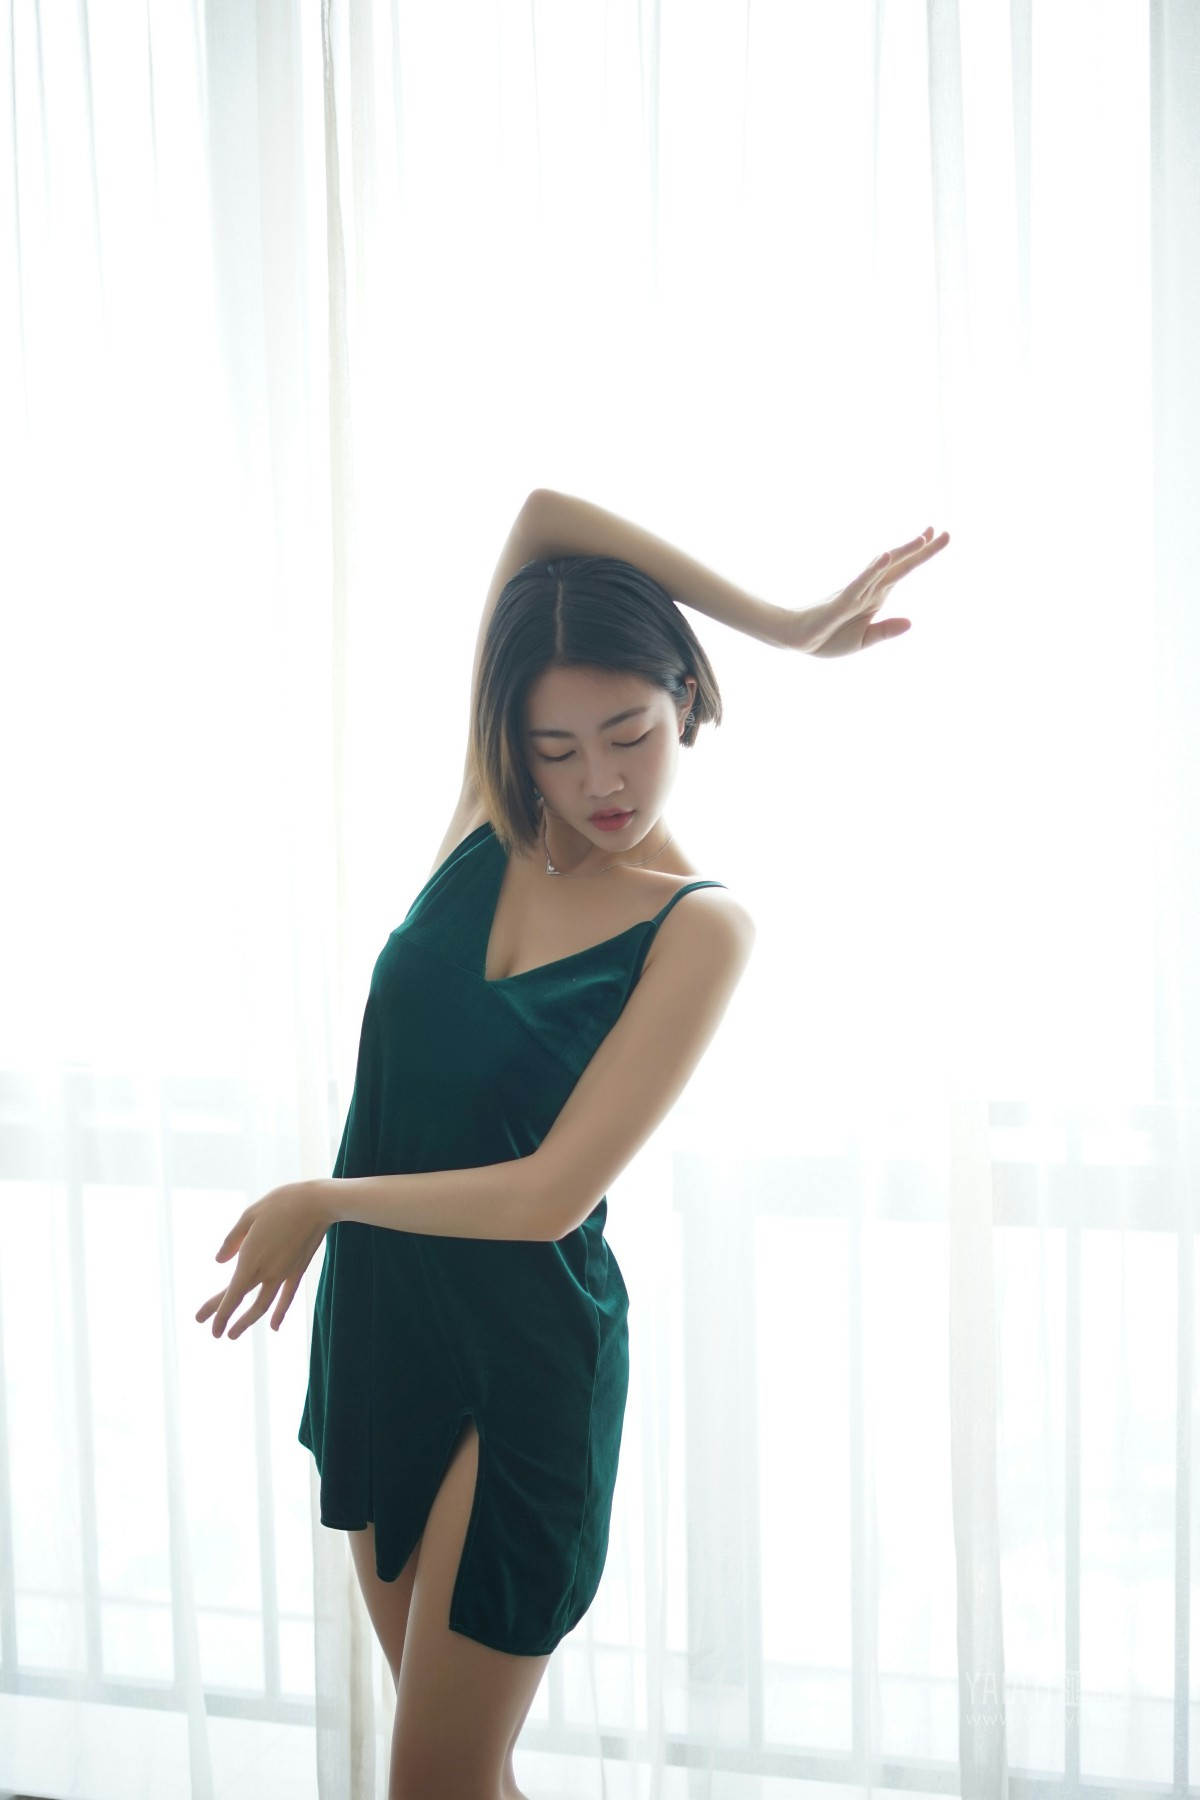 [YALAYI雅拉伊]2018.11.20 No.126 舞寂 肖萧 [42P] 雅拉伊 第4张